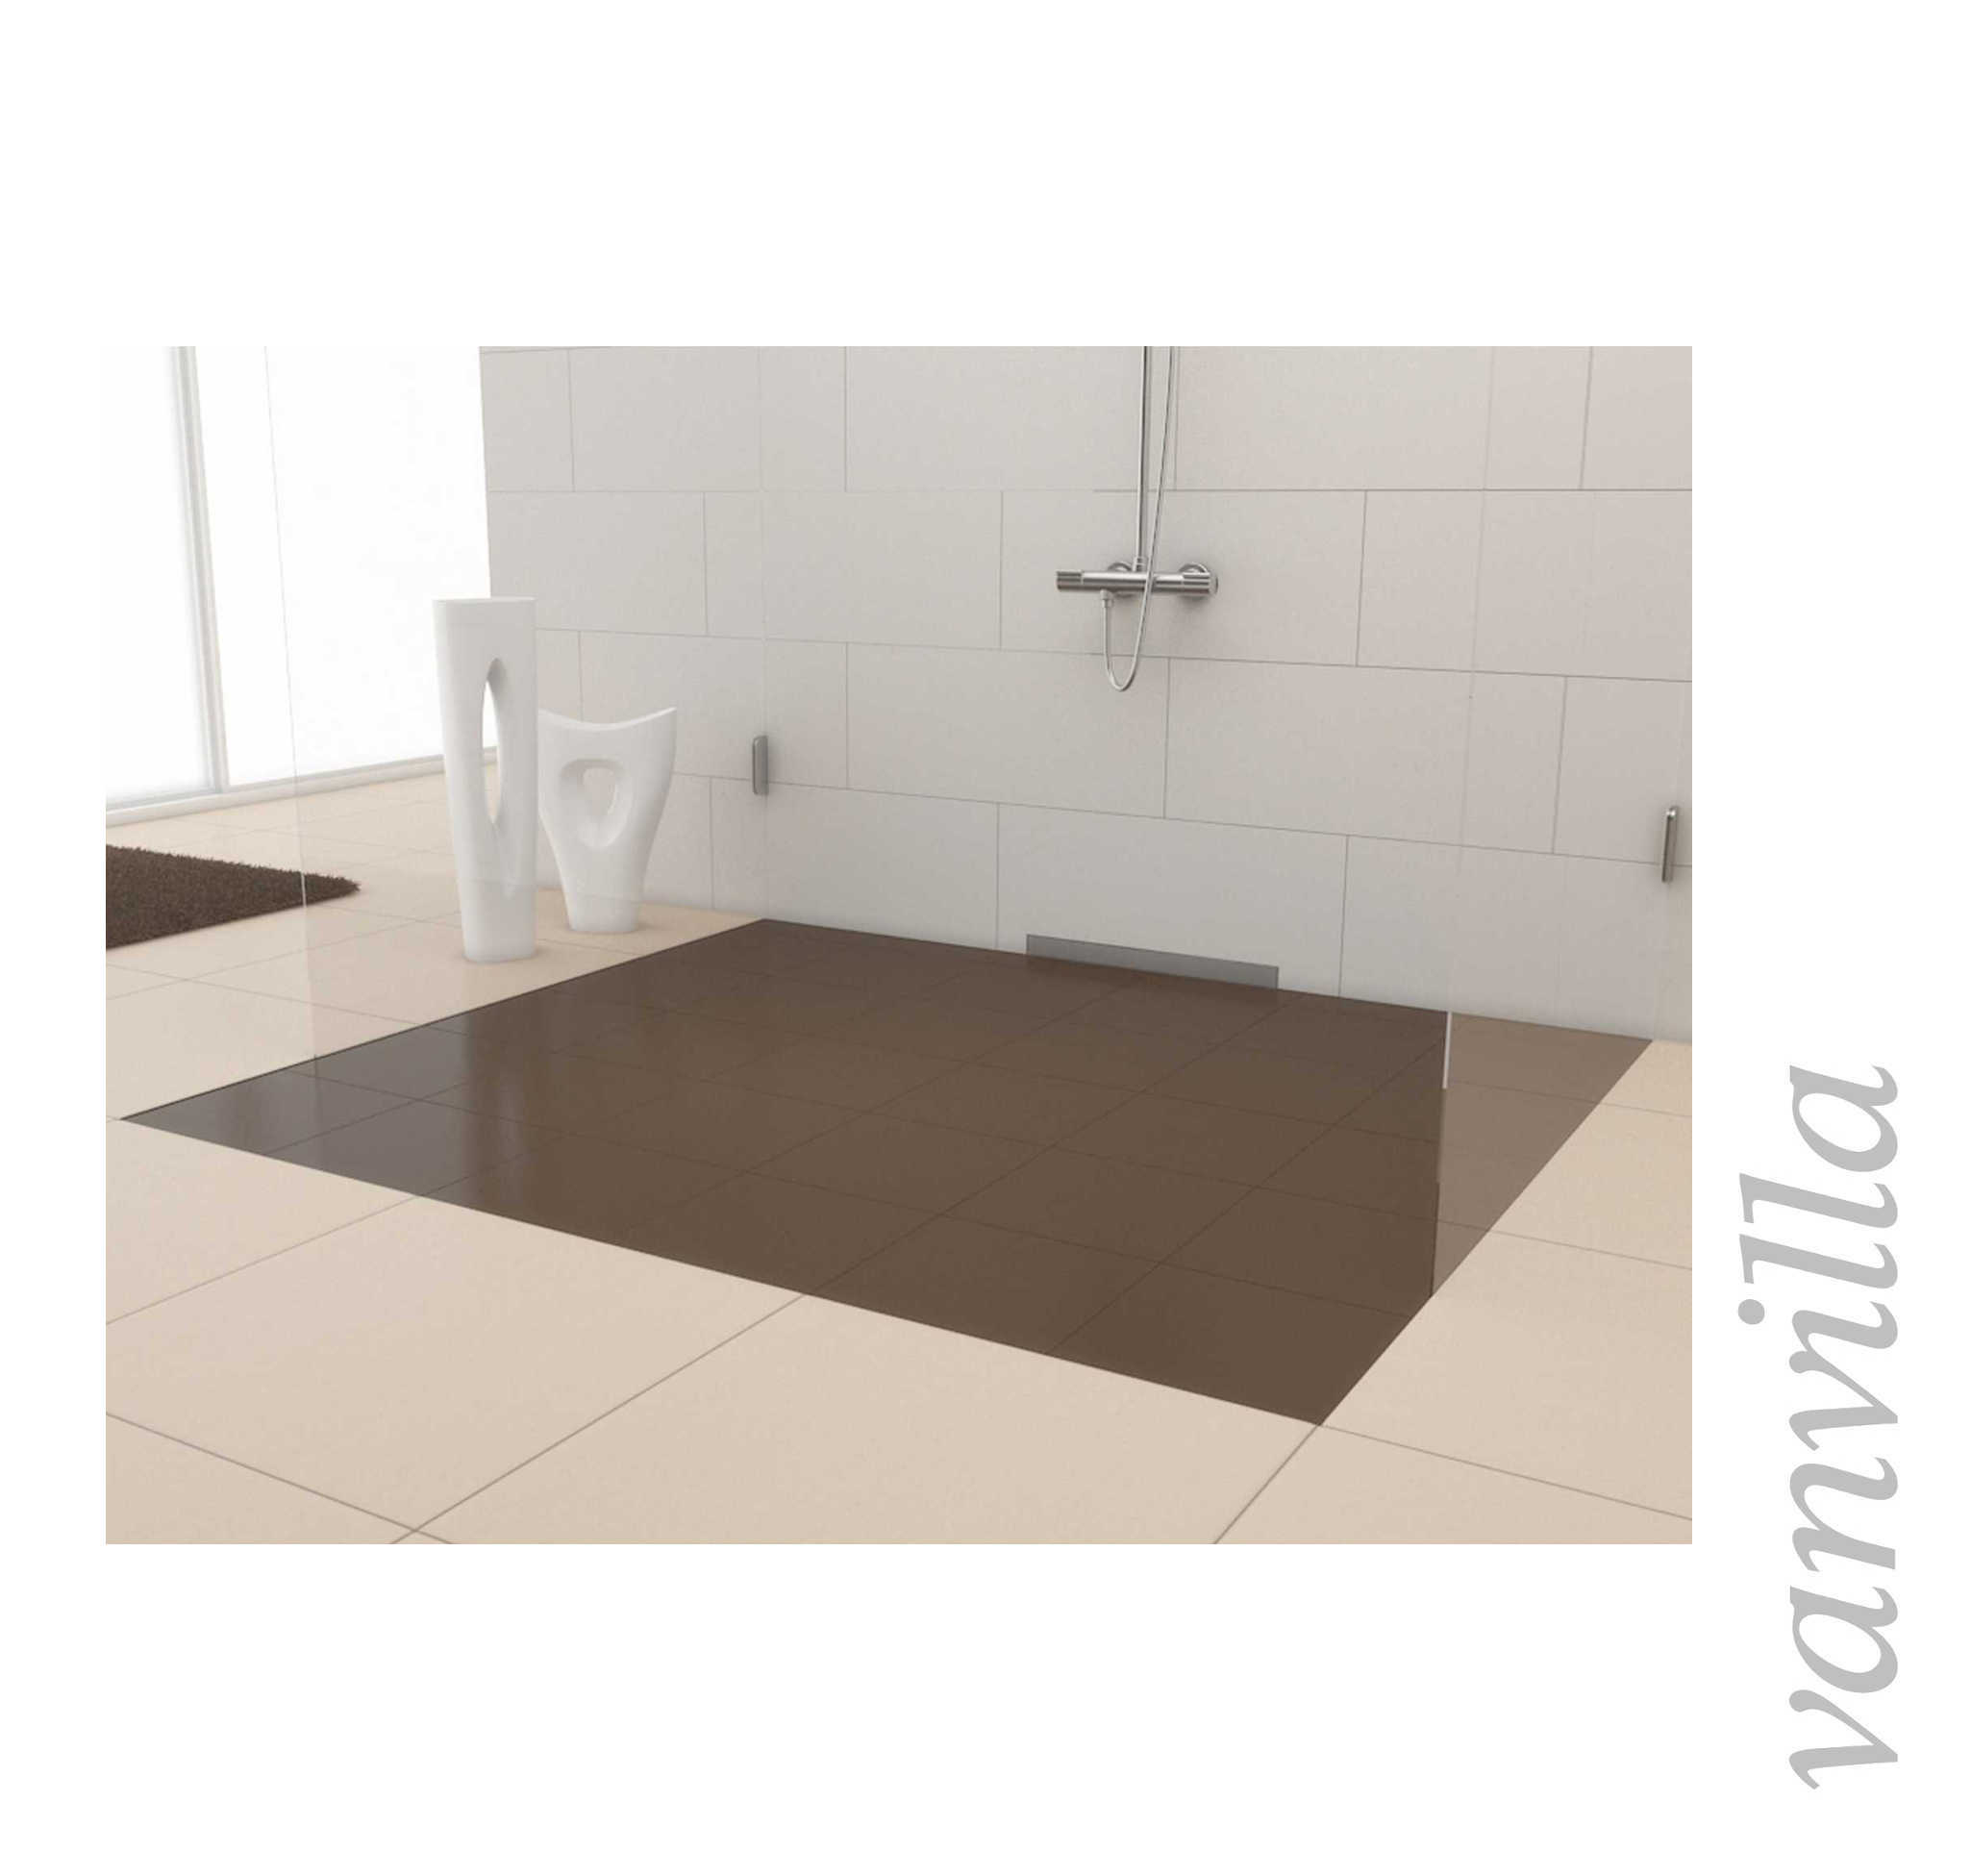 vanvilla wandablauf edelstahlblende und edelstahlsifon. Black Bedroom Furniture Sets. Home Design Ideas